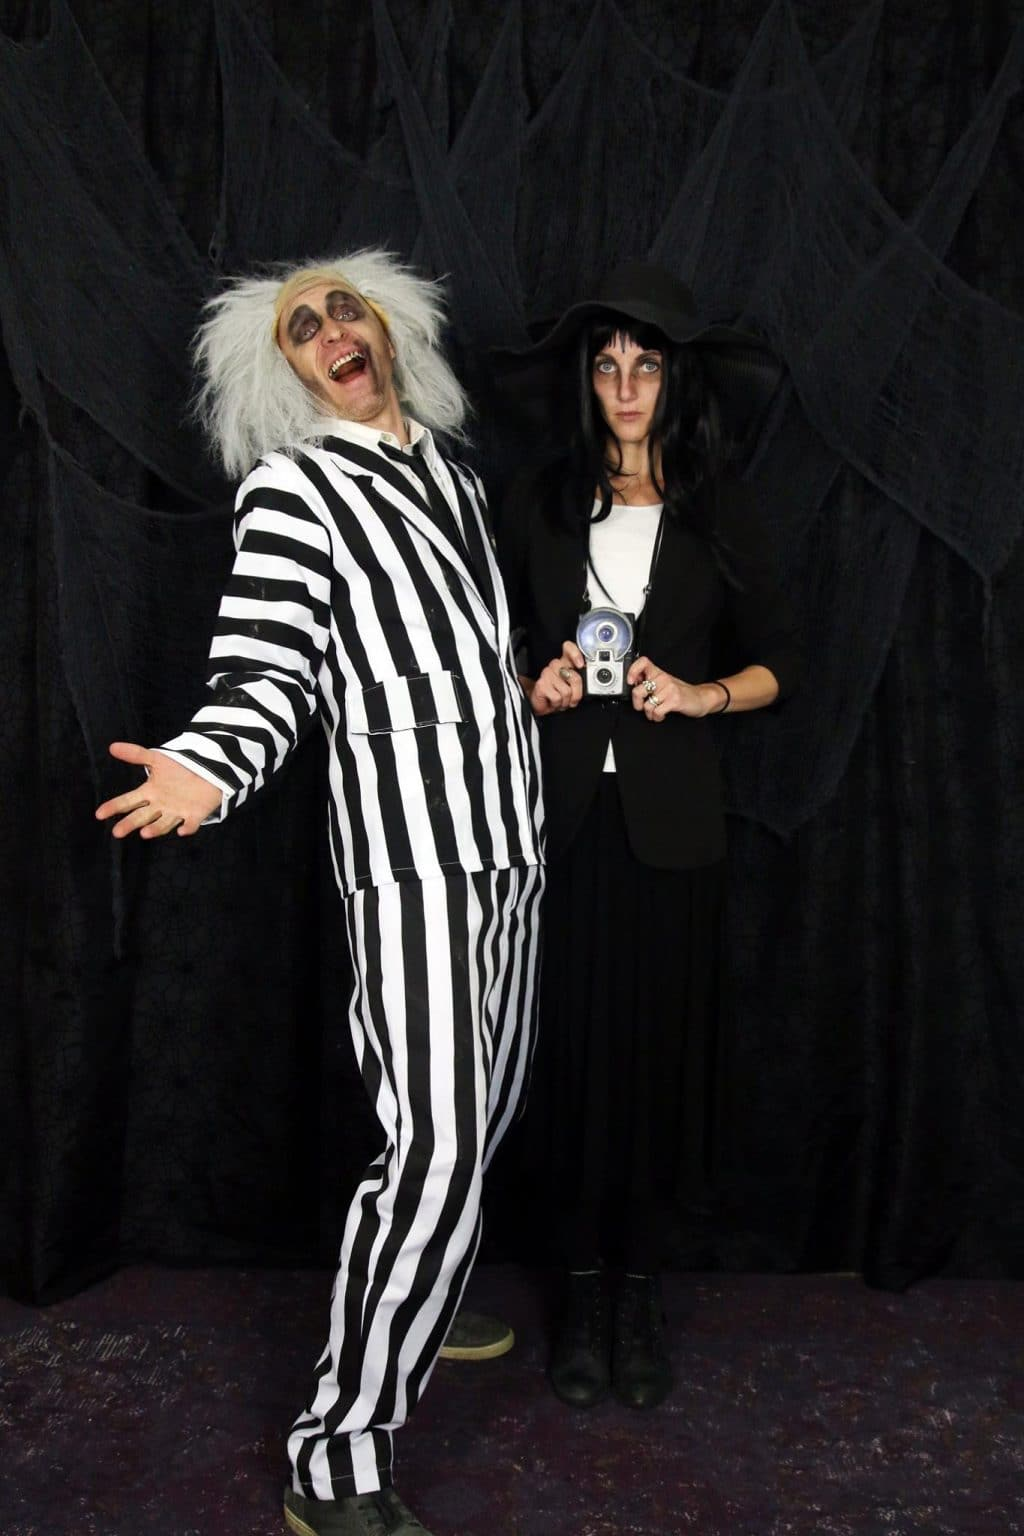 Beetlejuice and Lydia costume!